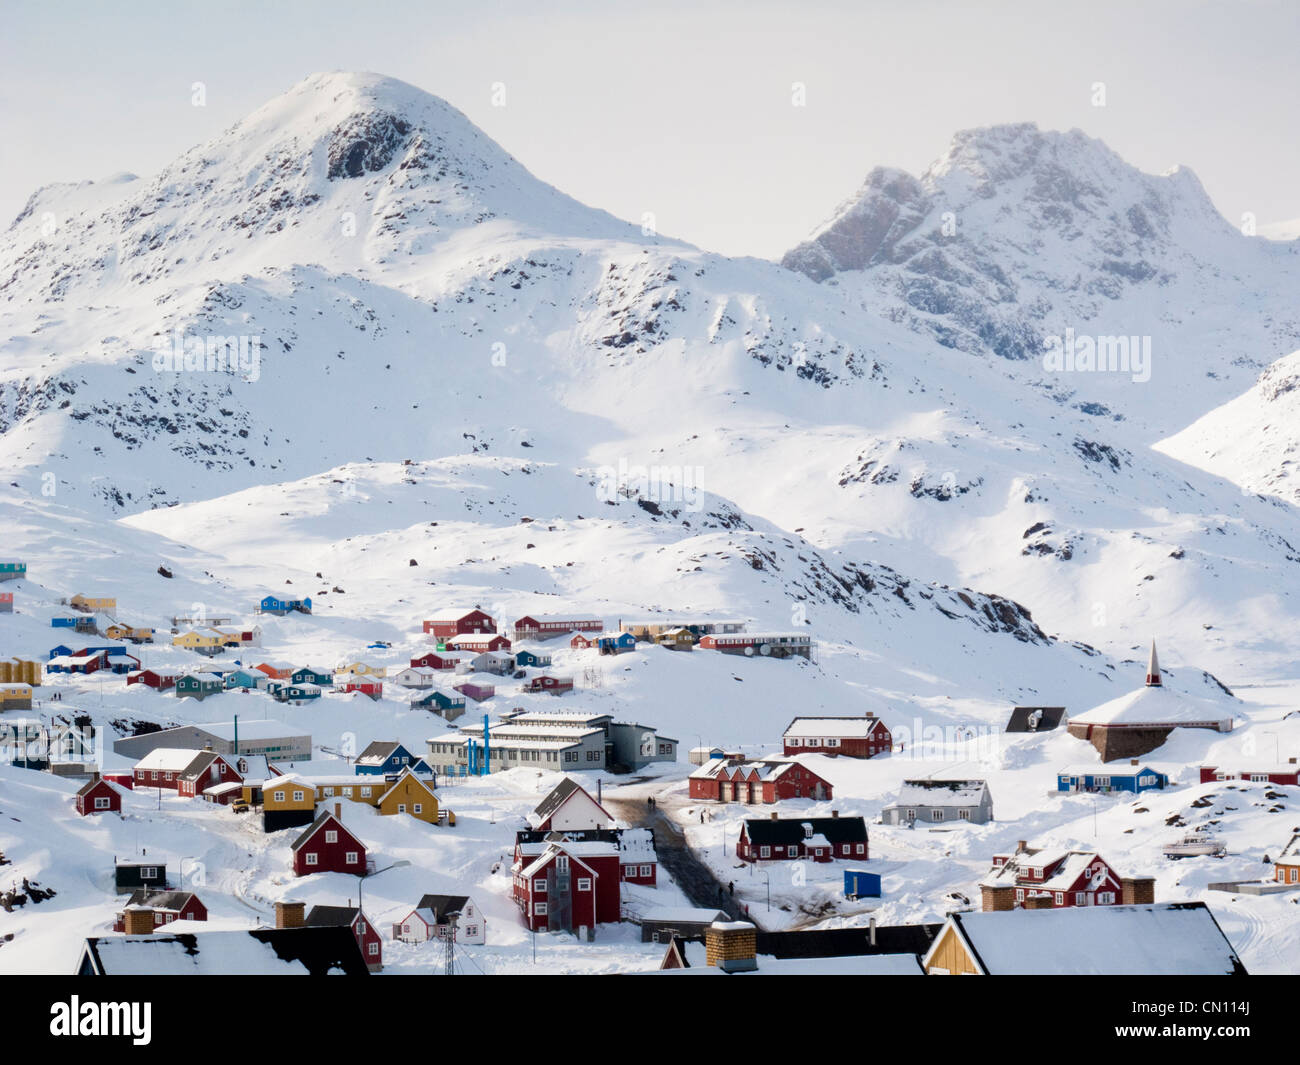 Arctic landscape Inuit village - Tasiilaq, Greenland - Stock Image